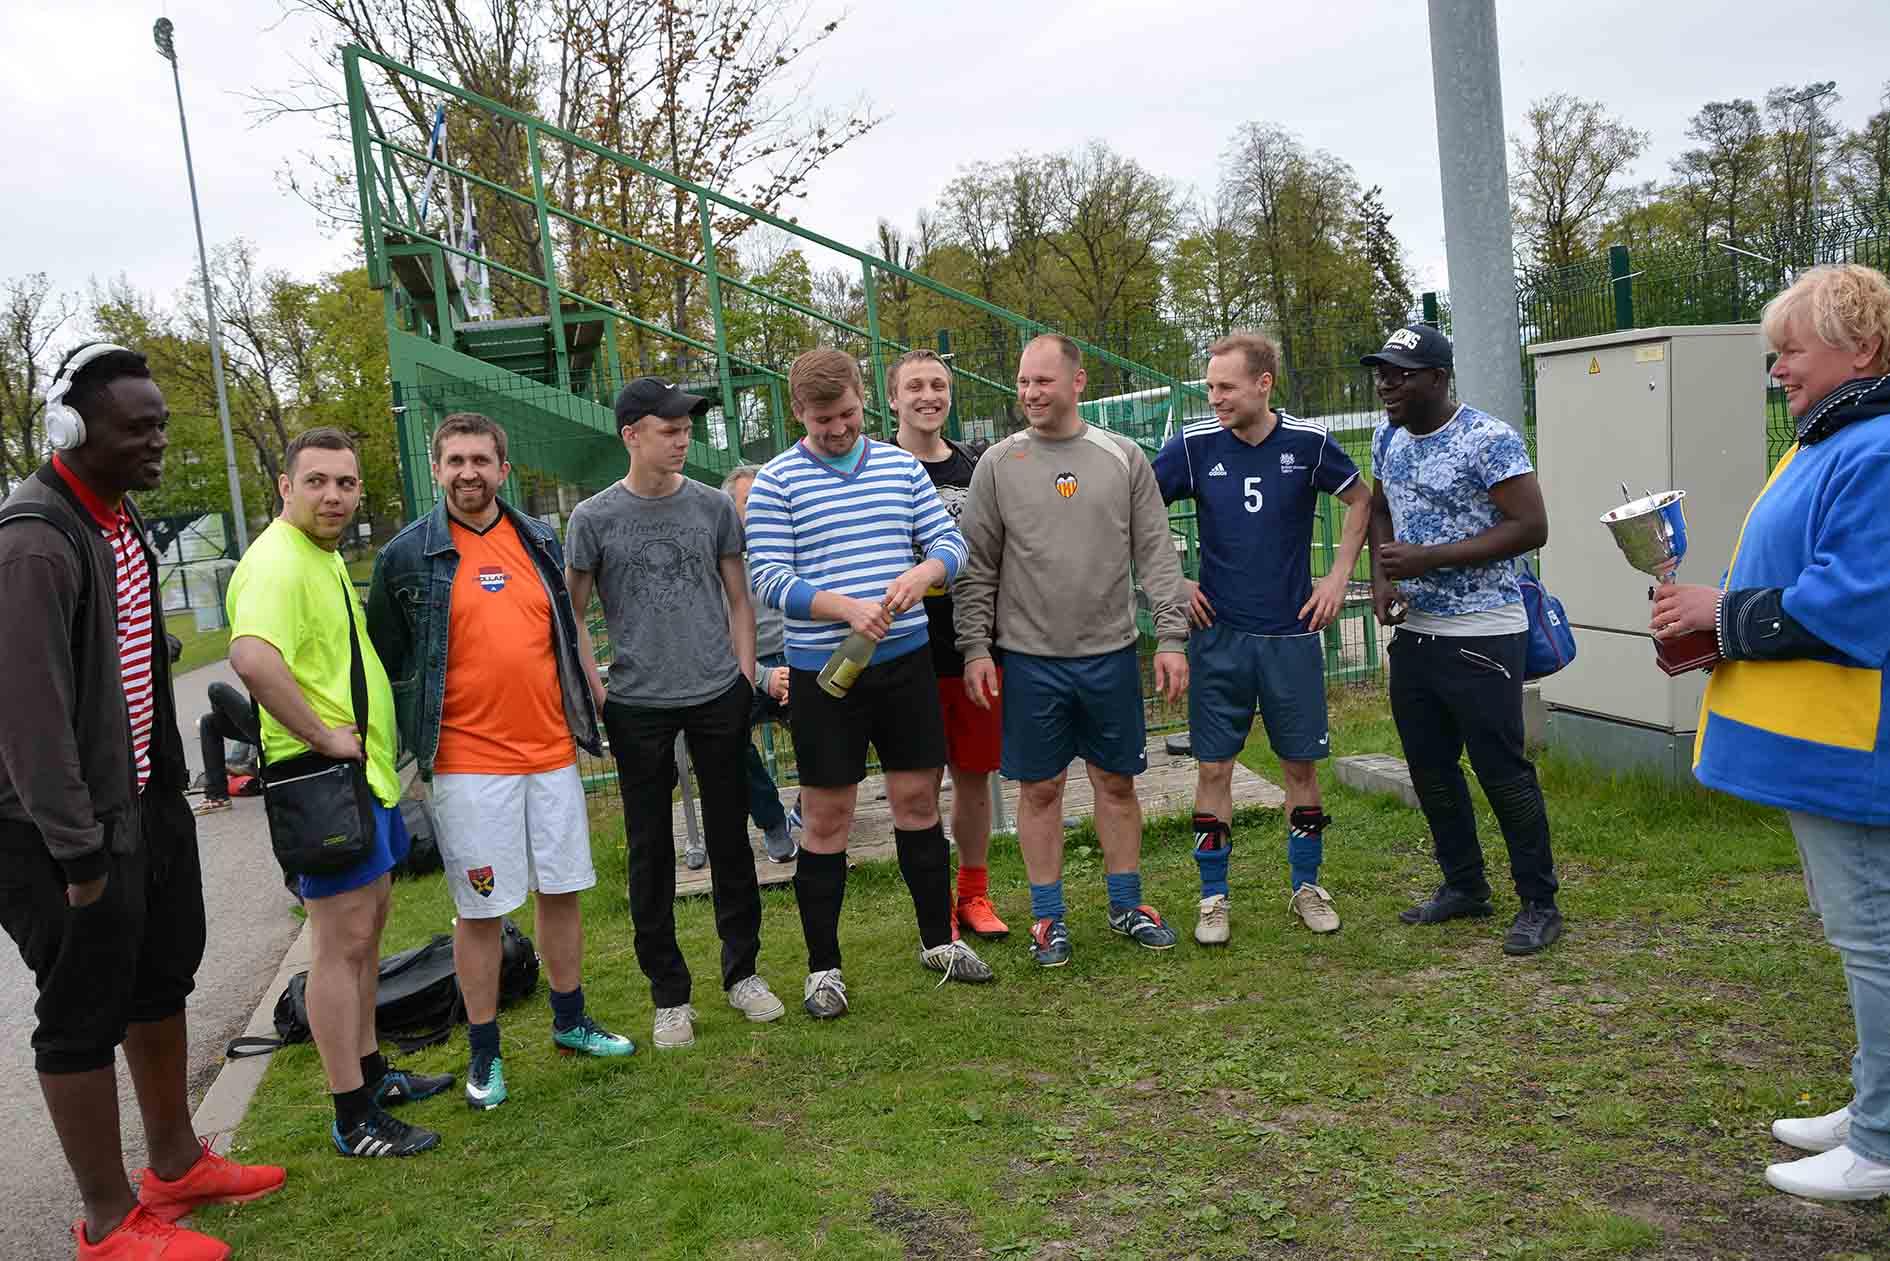 2017.05.27 Football tournament (13)